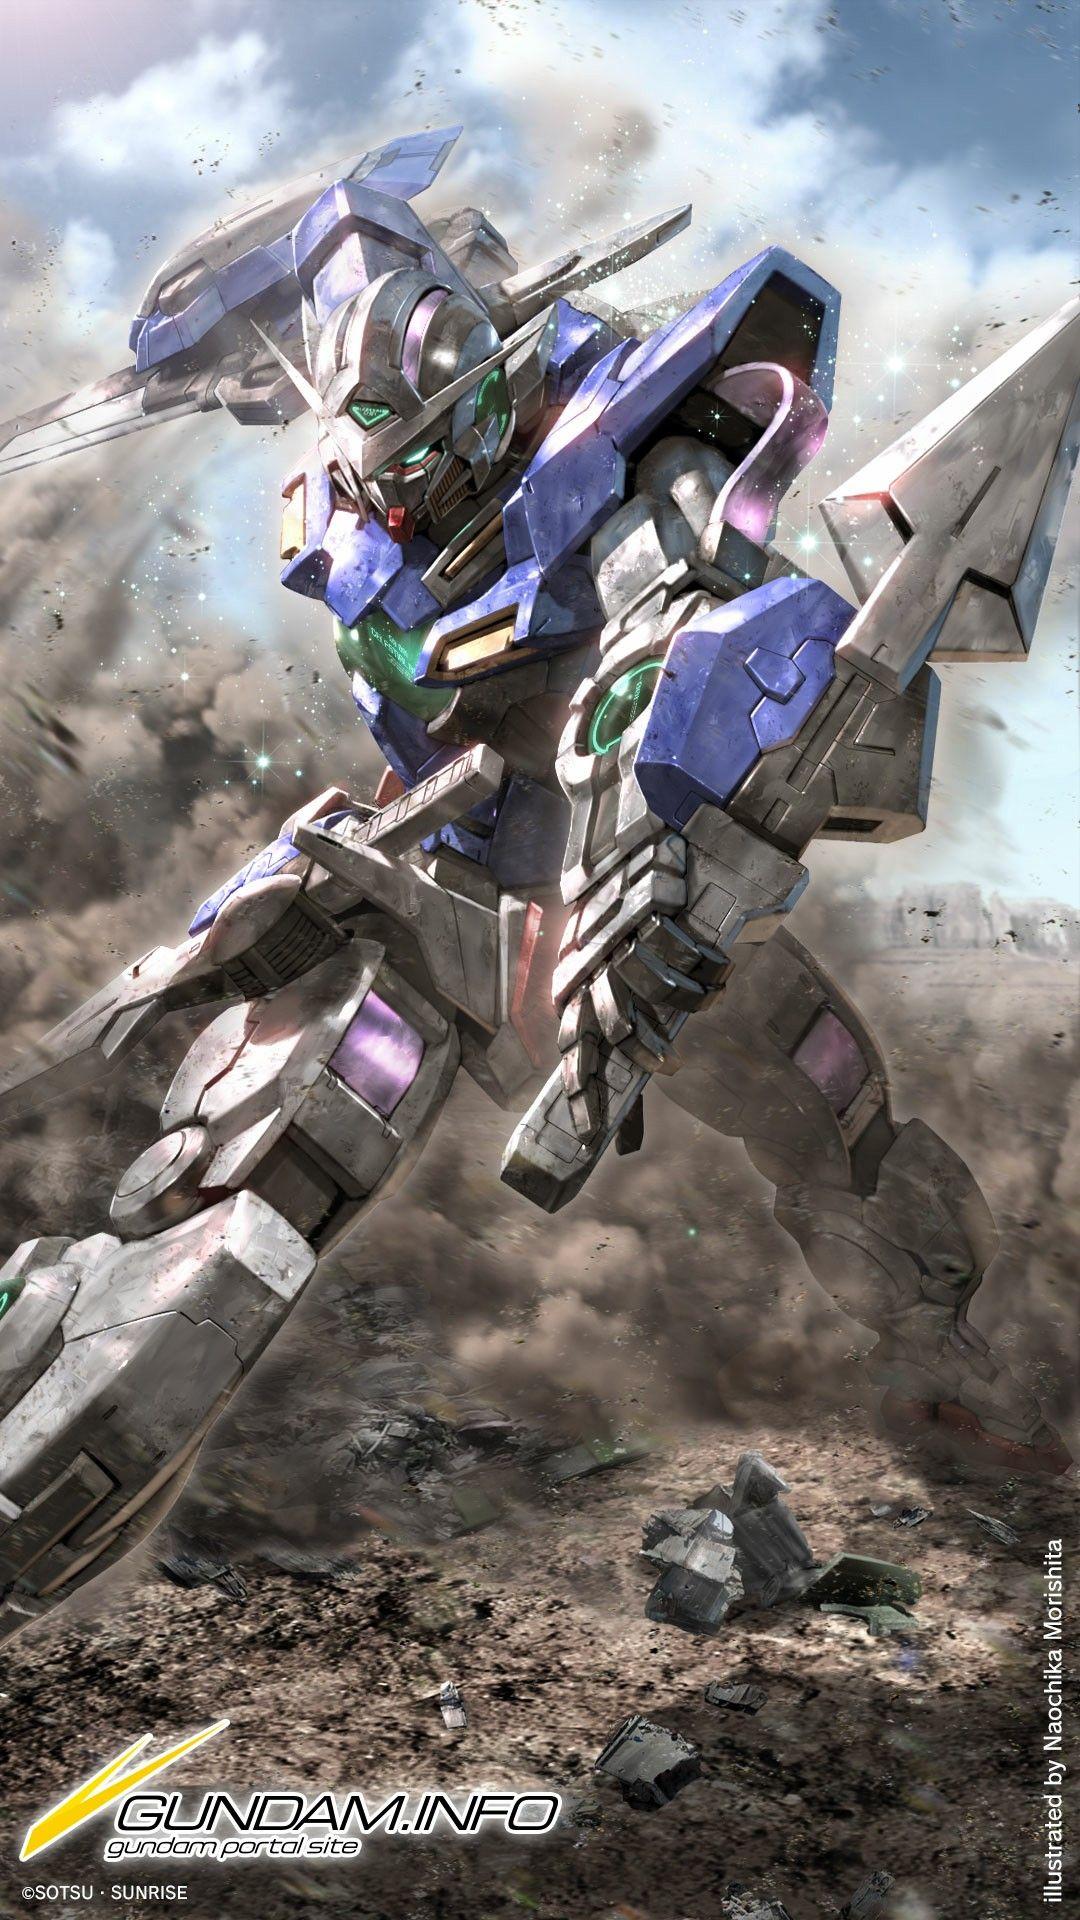 Storming Into Battle Gundam Toys Gundam Wallpapers